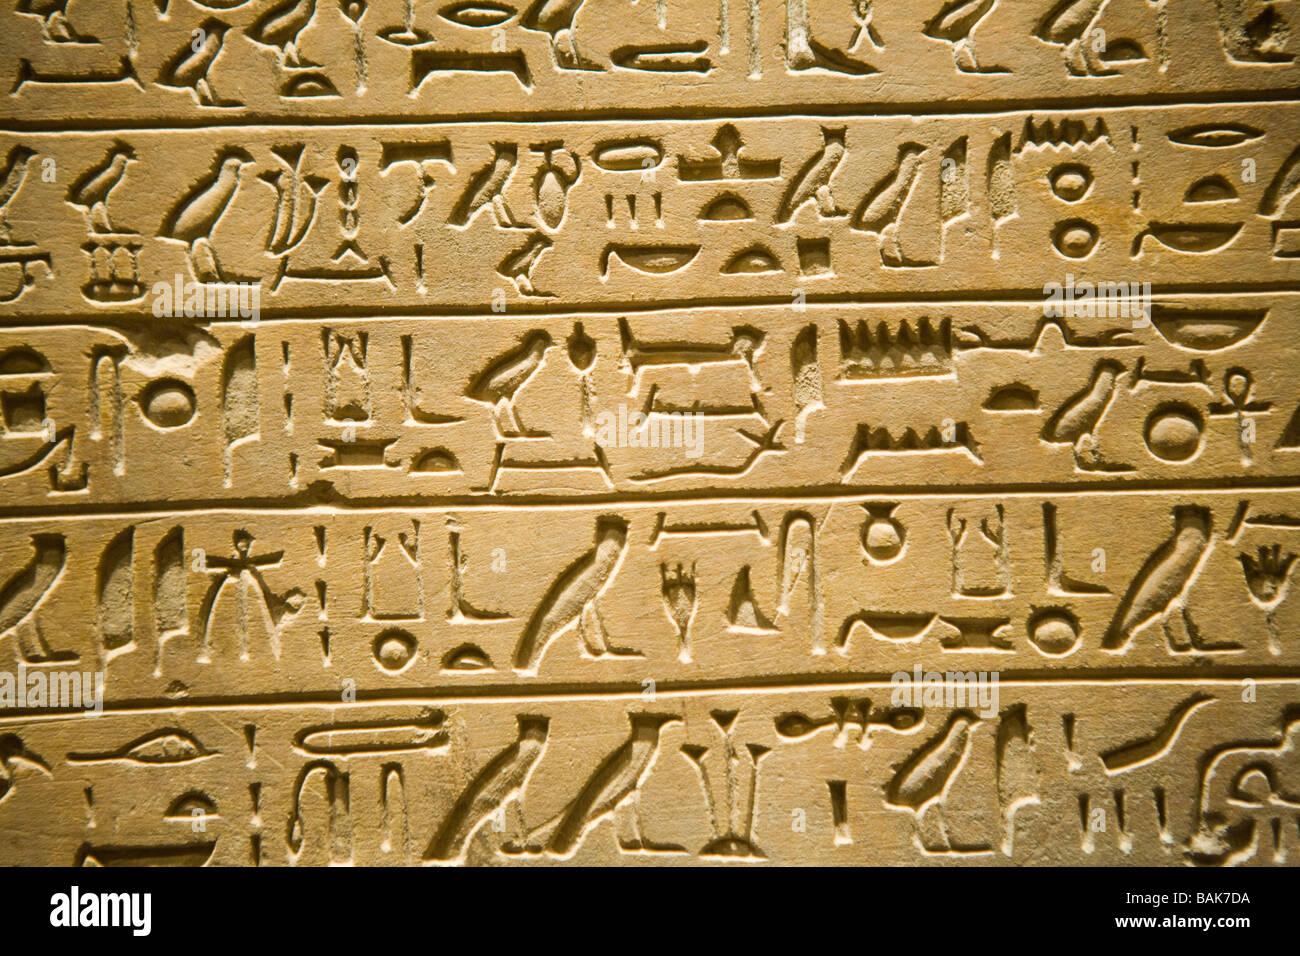 Egyptian Hieroglyphics At Metropolitan Museum Of Art New